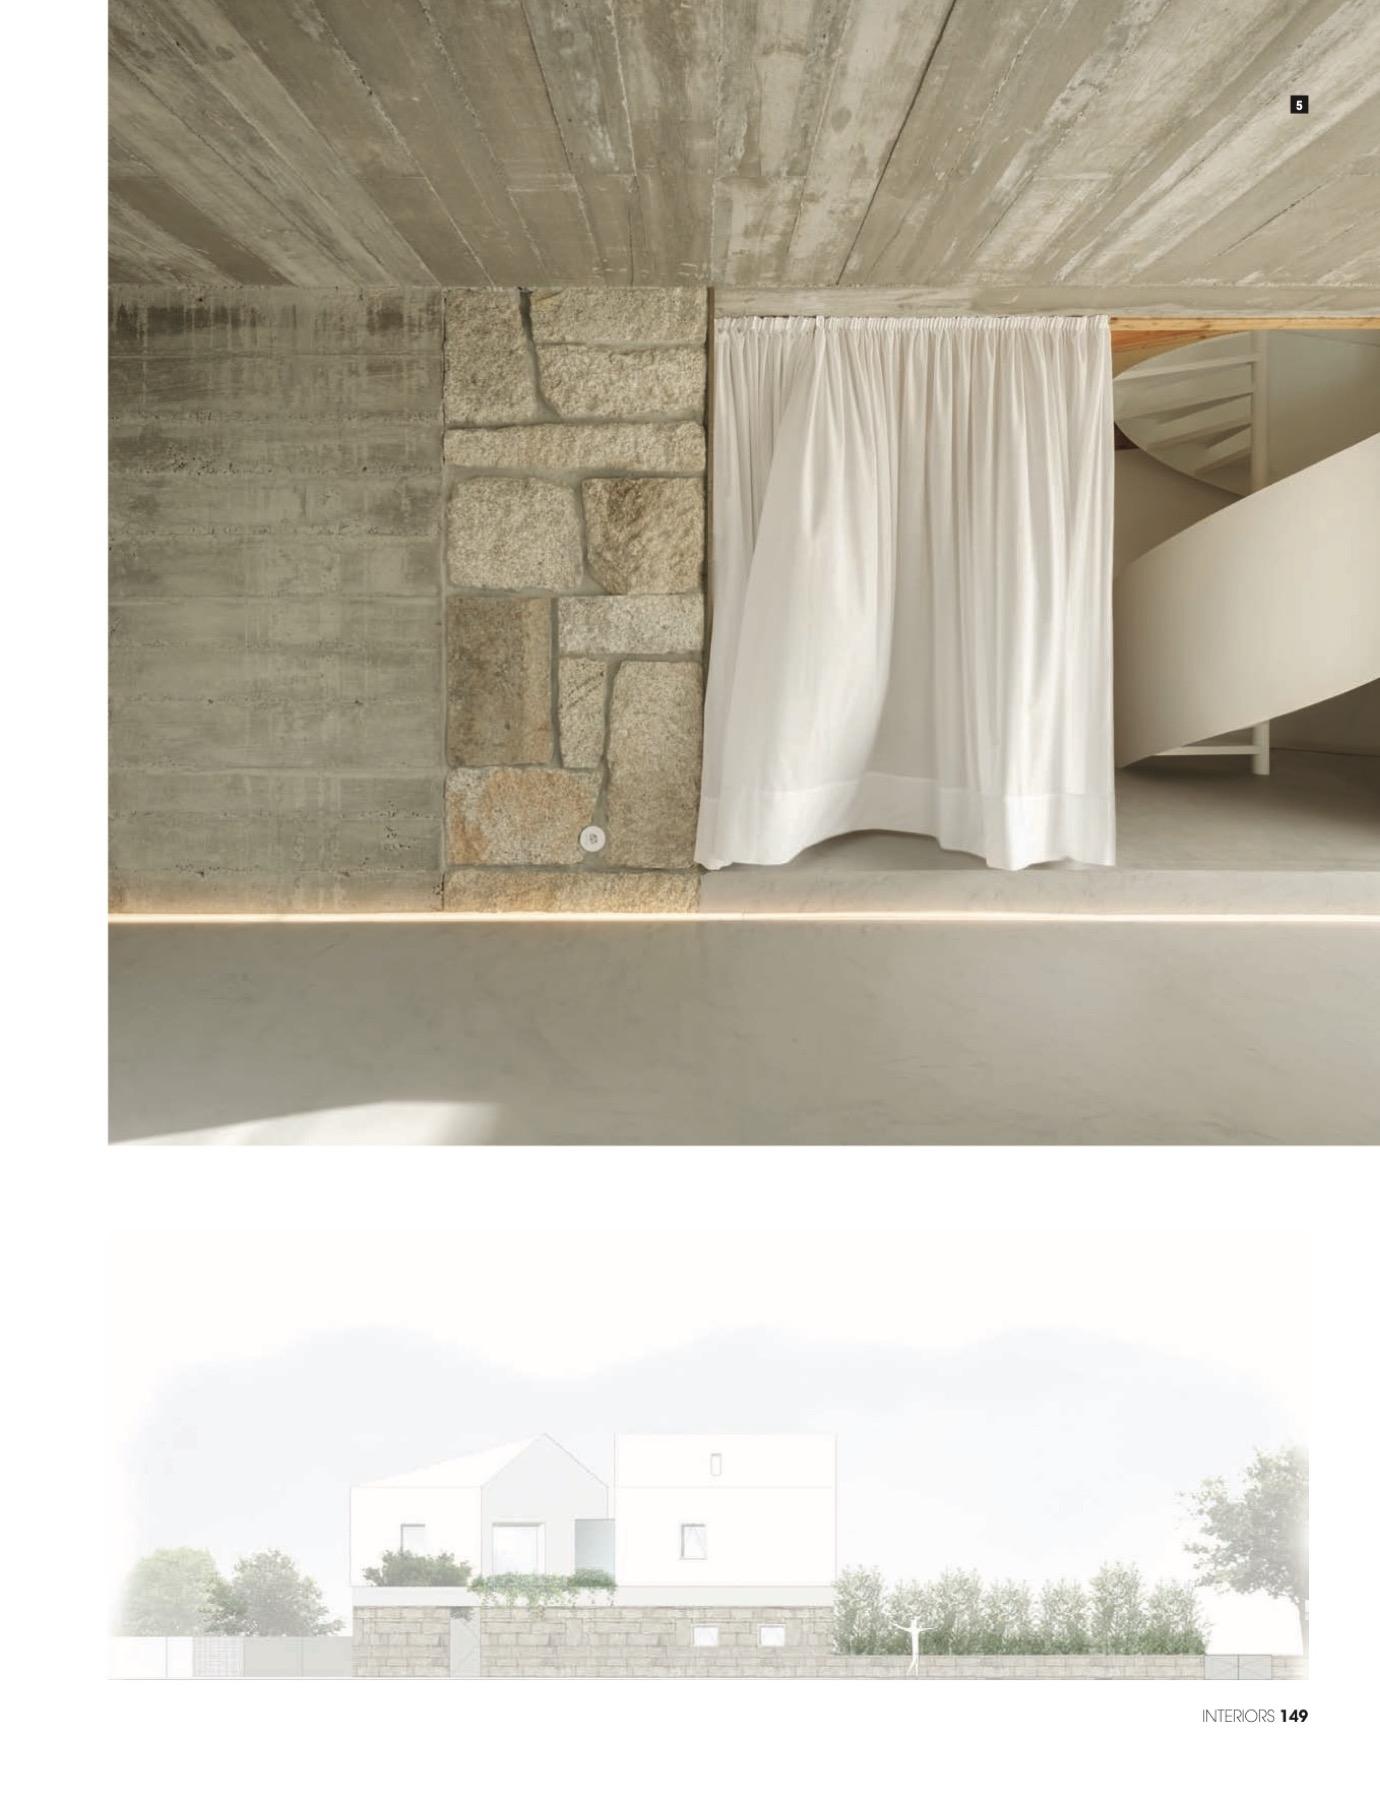 INTERIORS KOREA 414 casa rio paulo merlini ivo tavares studio 8 9